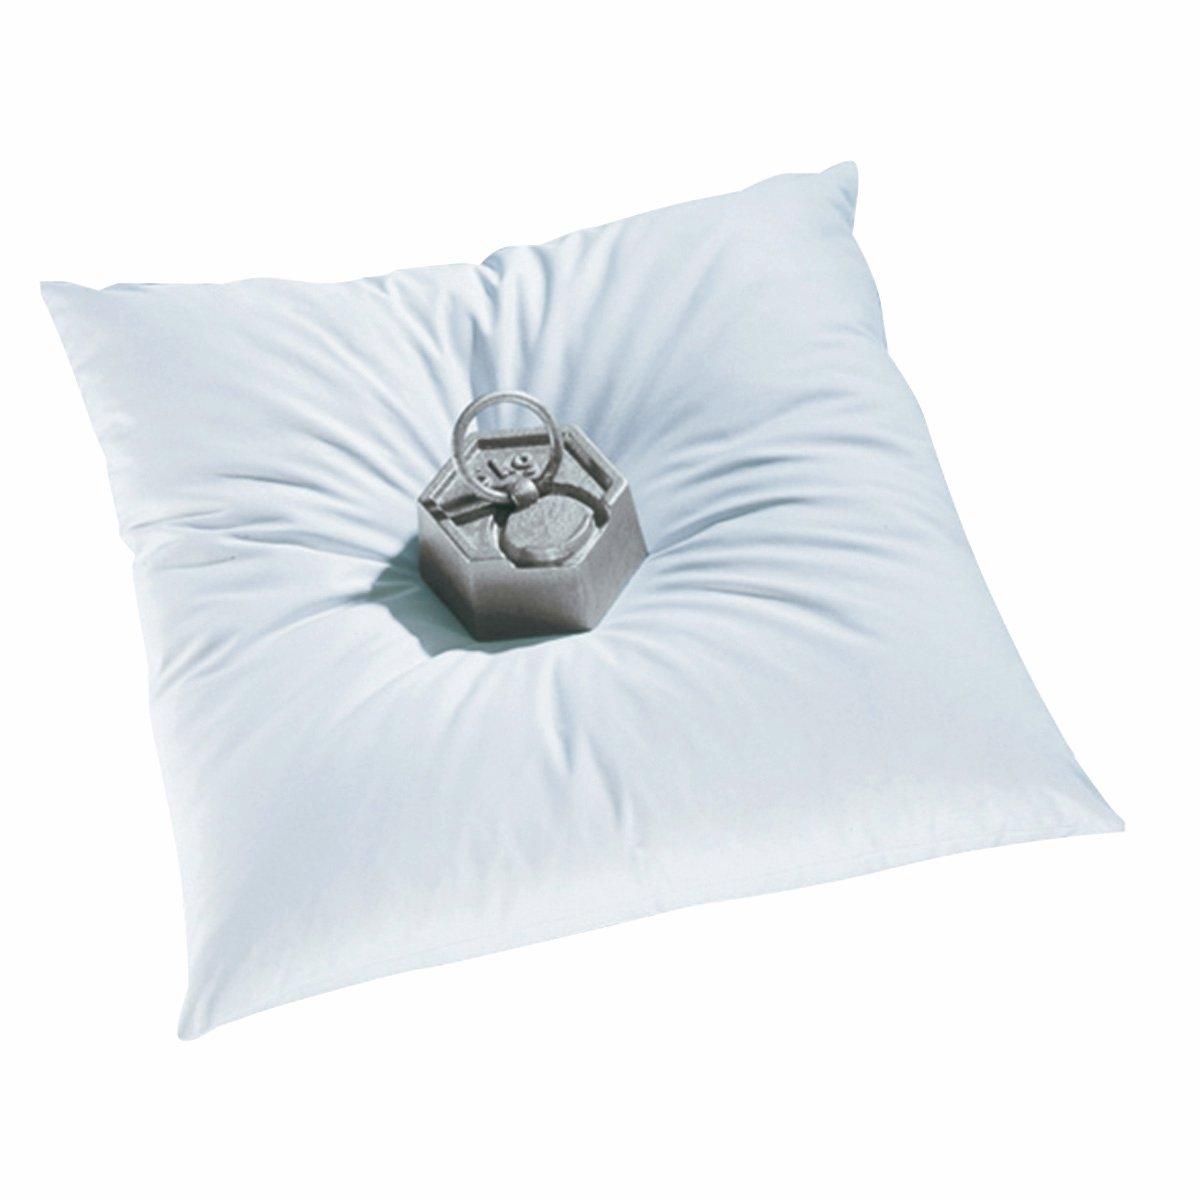 Подушка La Redoute Из пуха 2 x 65 x 65 см белый цены